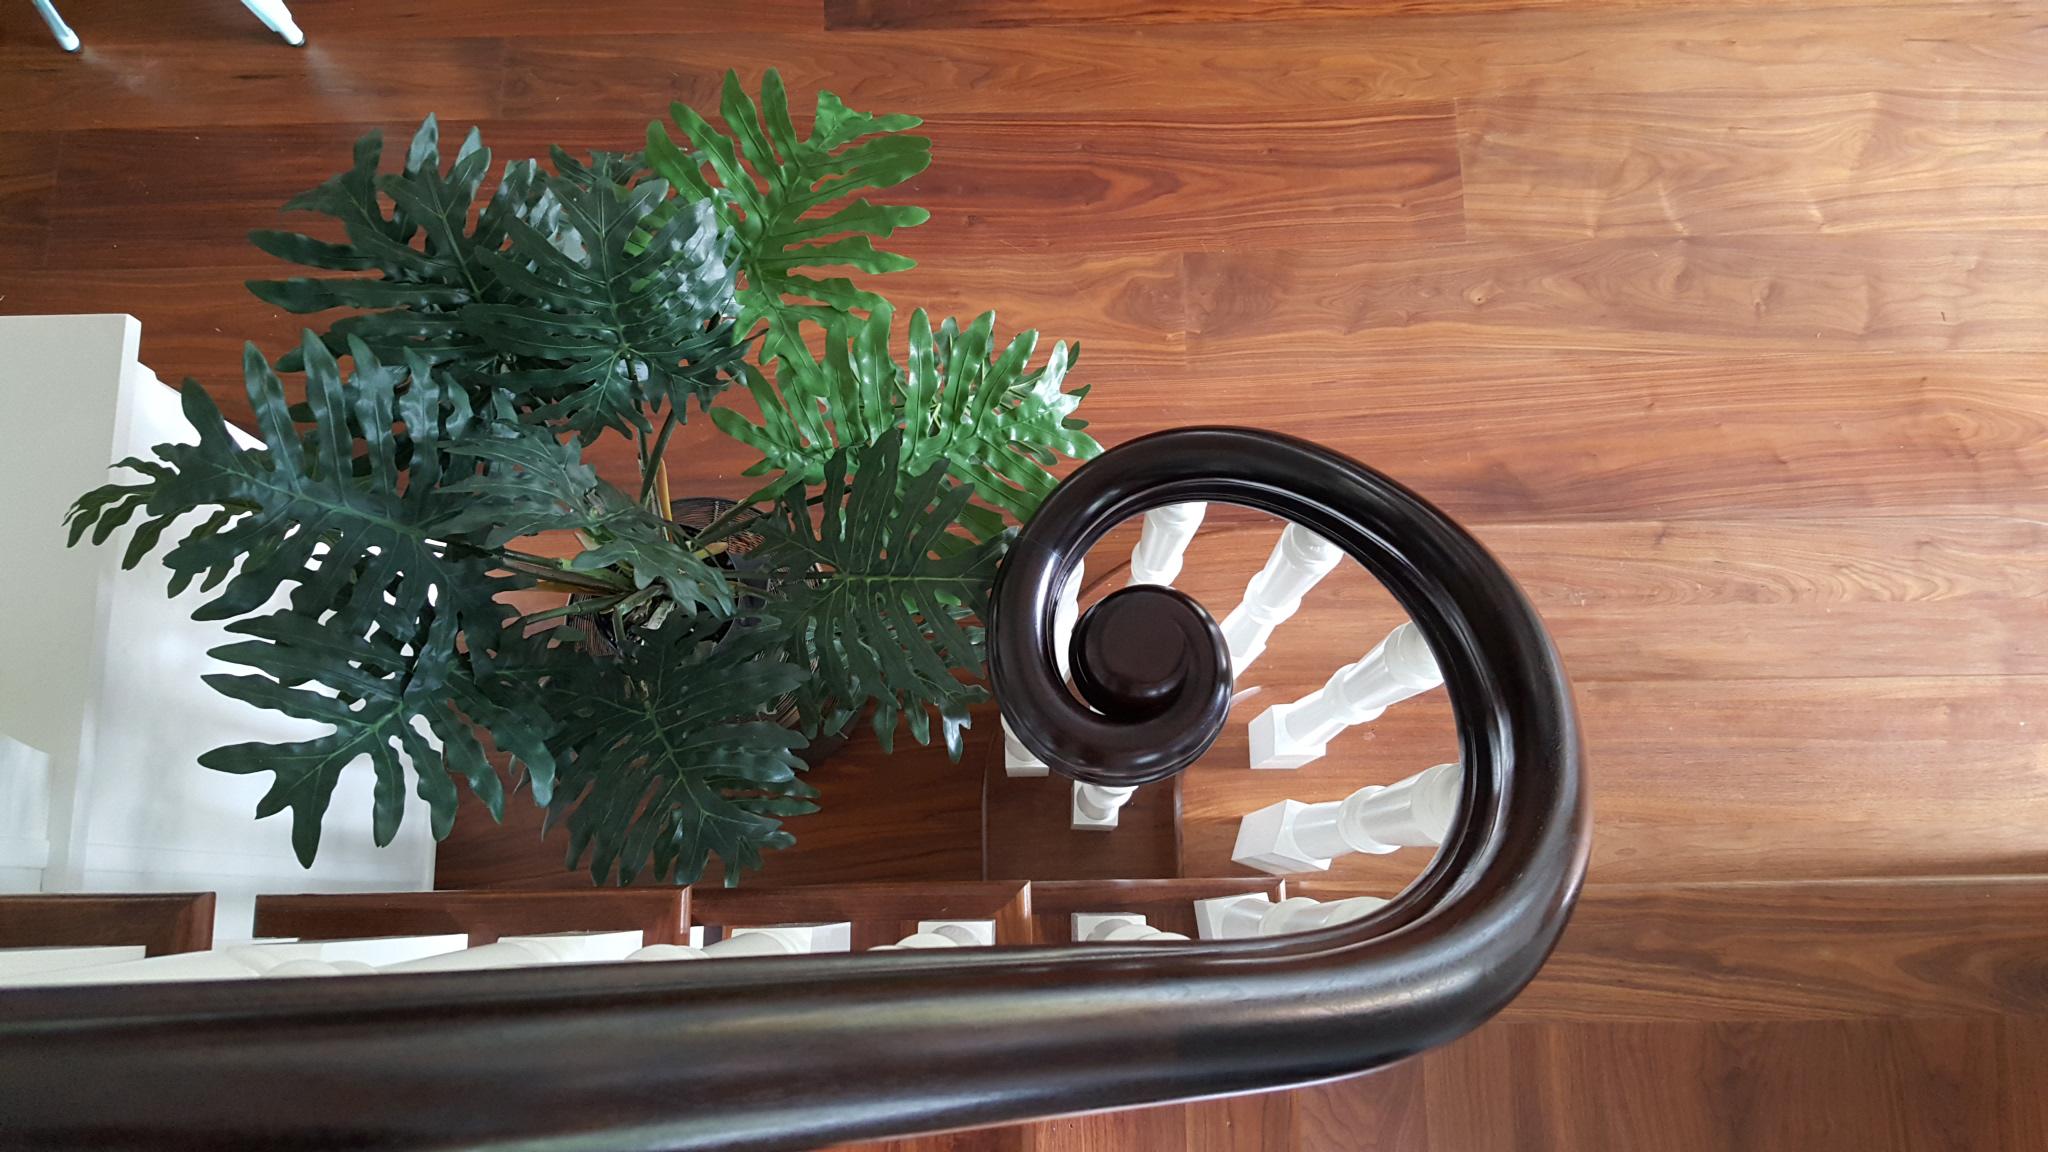 Oak Pointe_Handrail and Fittings (6).jpg